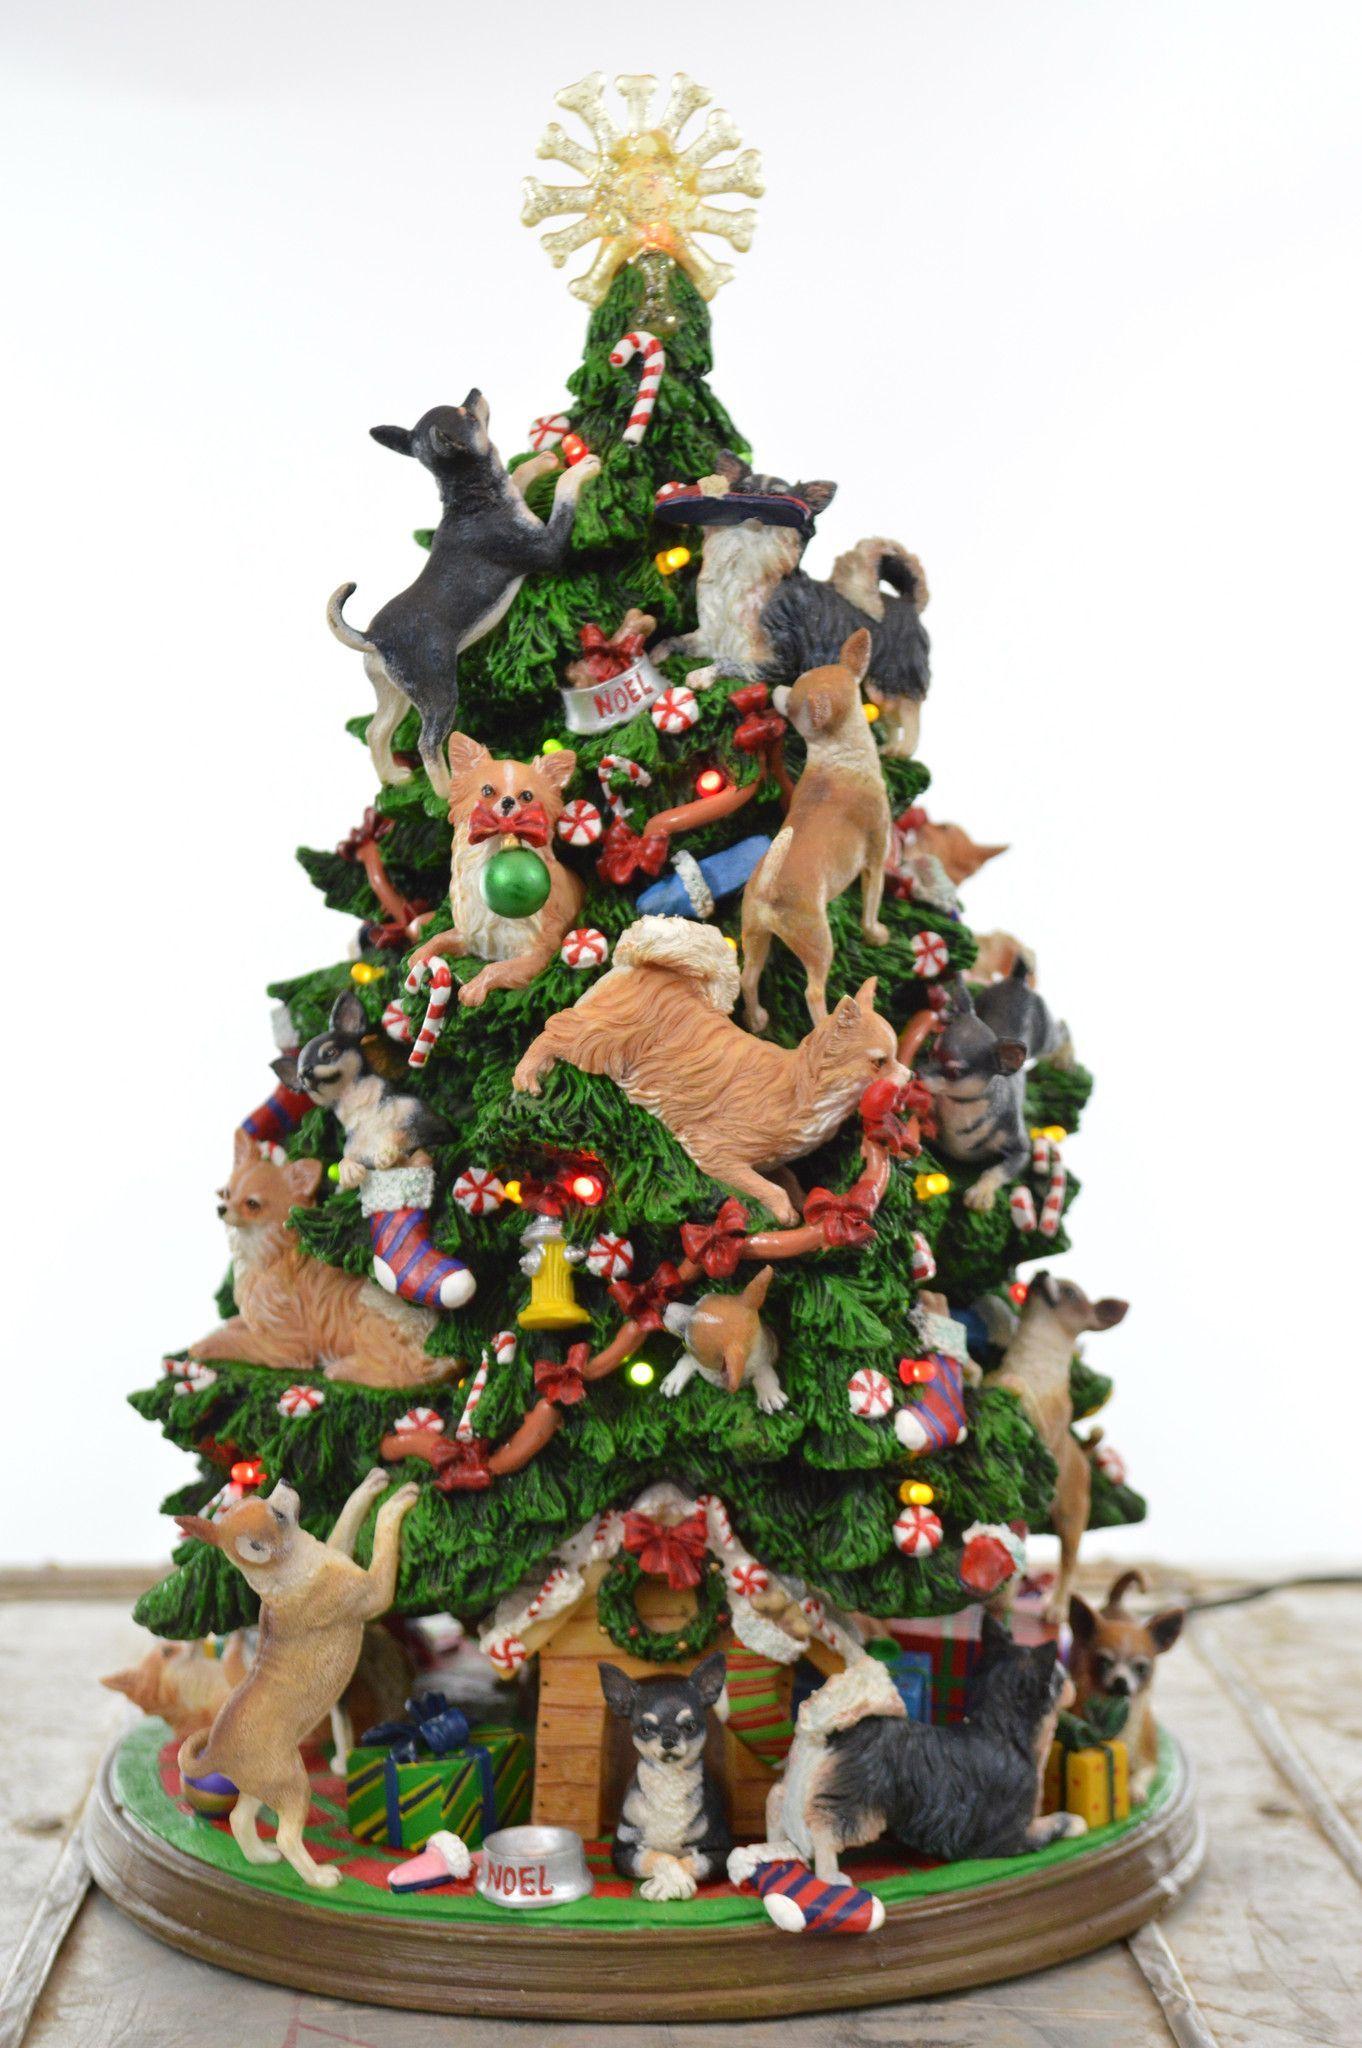 Danbury Mint Chihuahua Christmas Tree with Holiday Lights